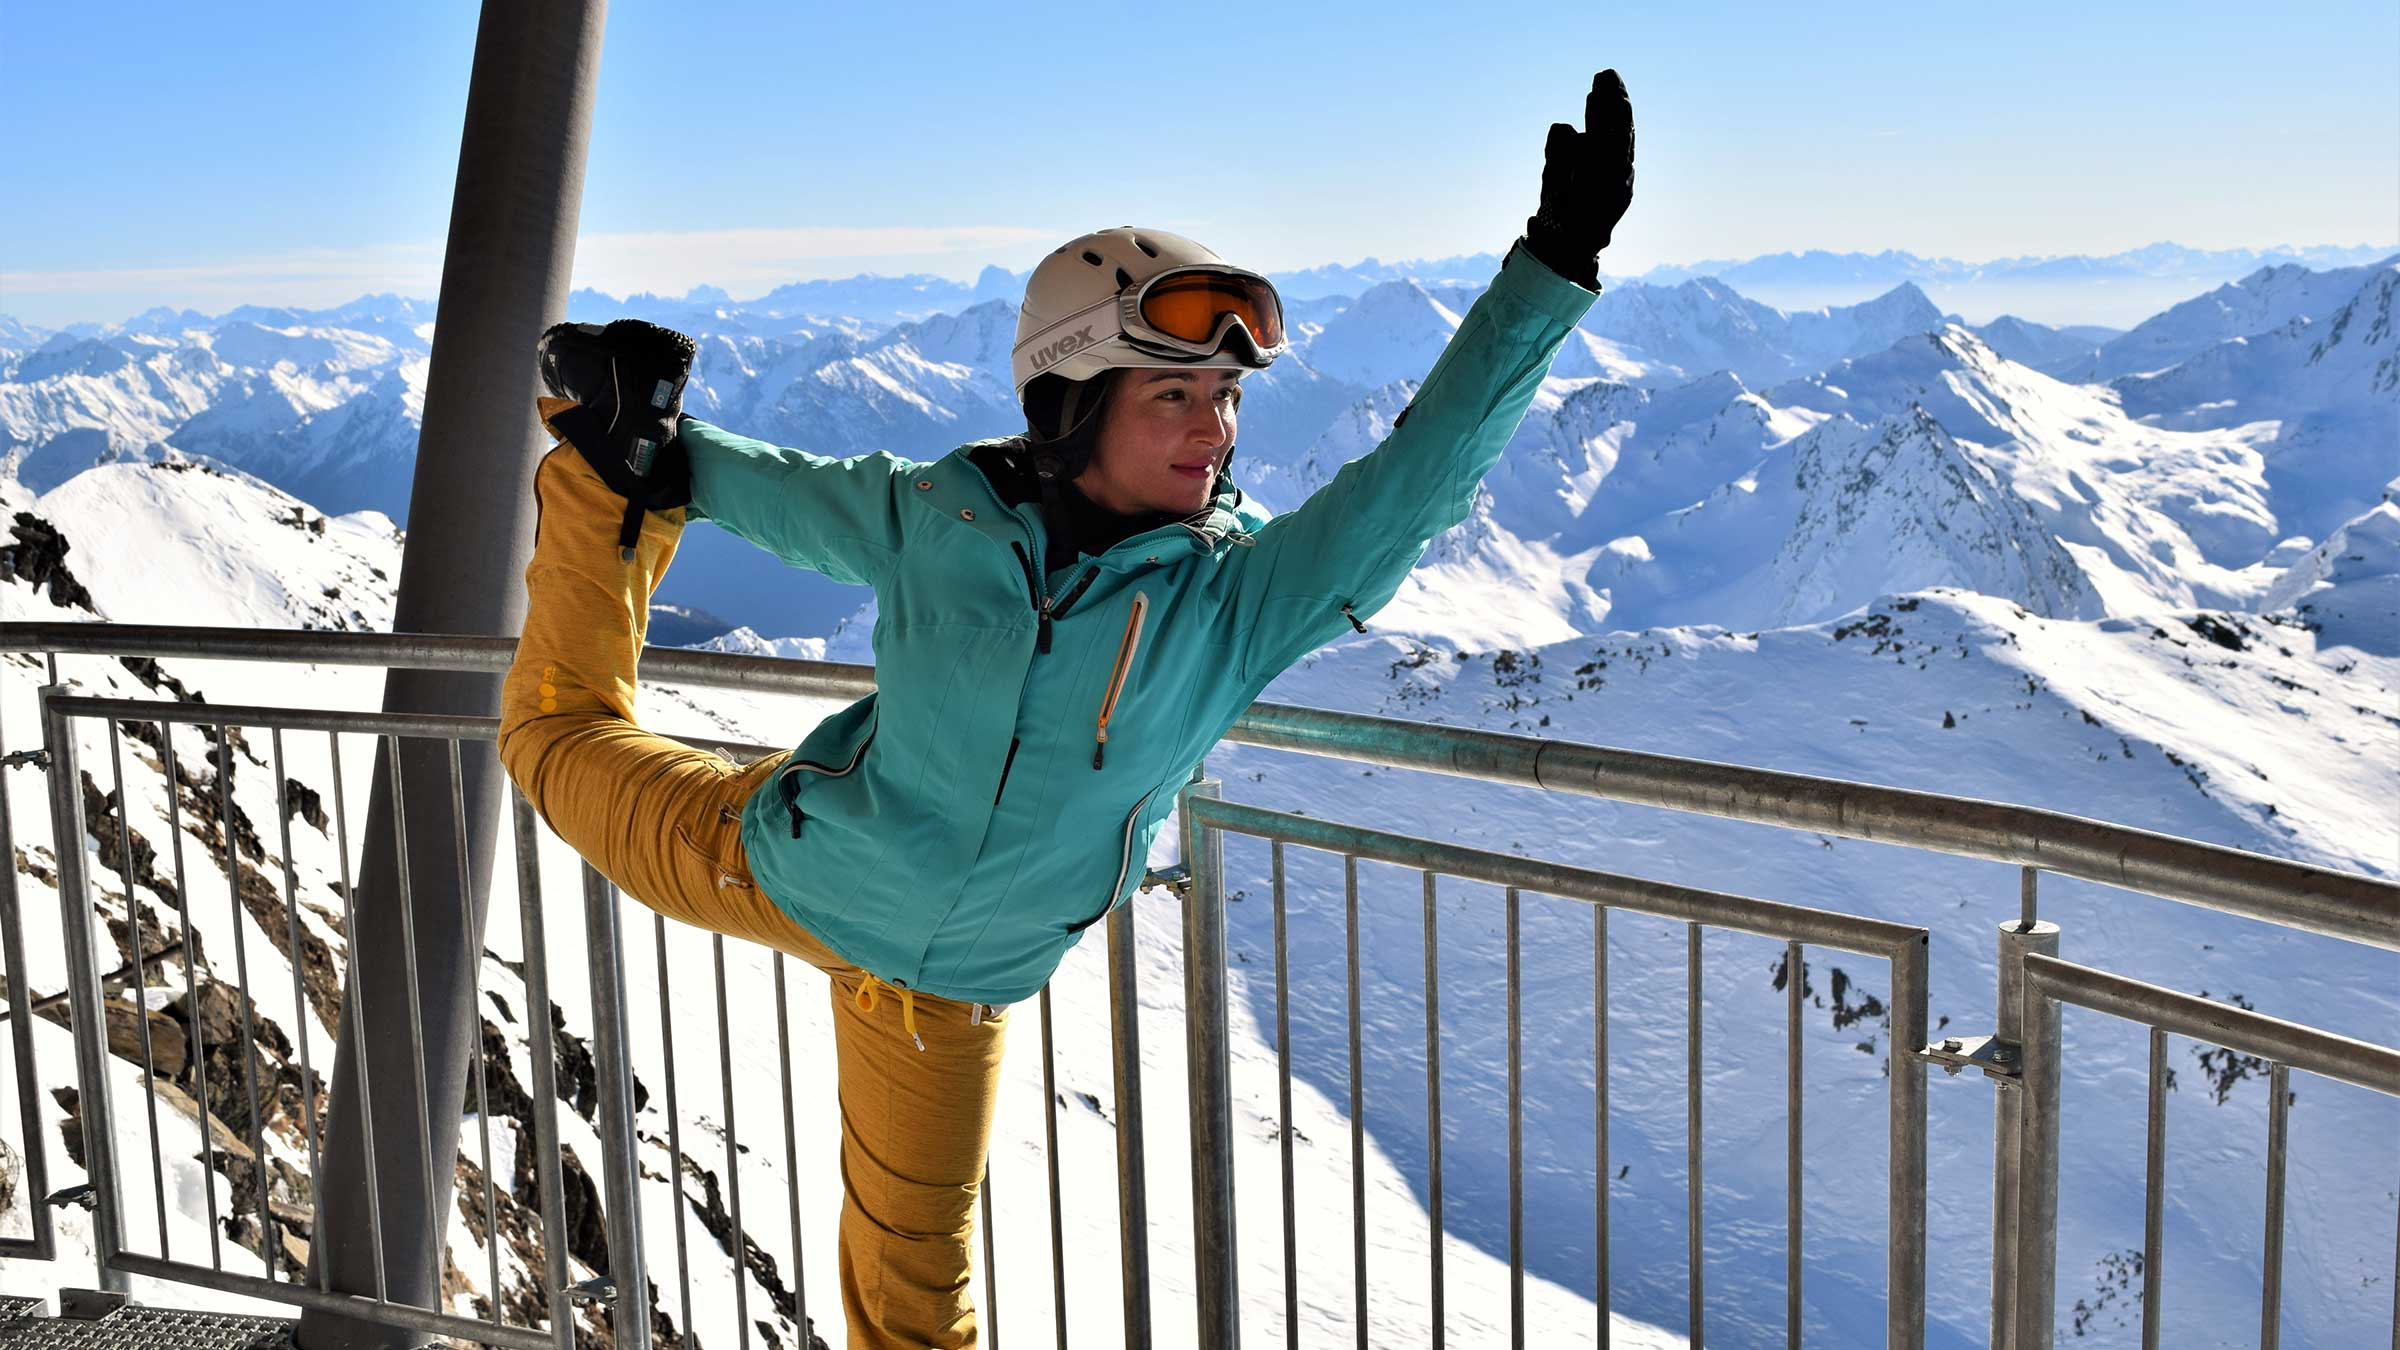 Snowboarderin beim Yoga - Alpine Yoga mit Apura Yoga in Obergurgl